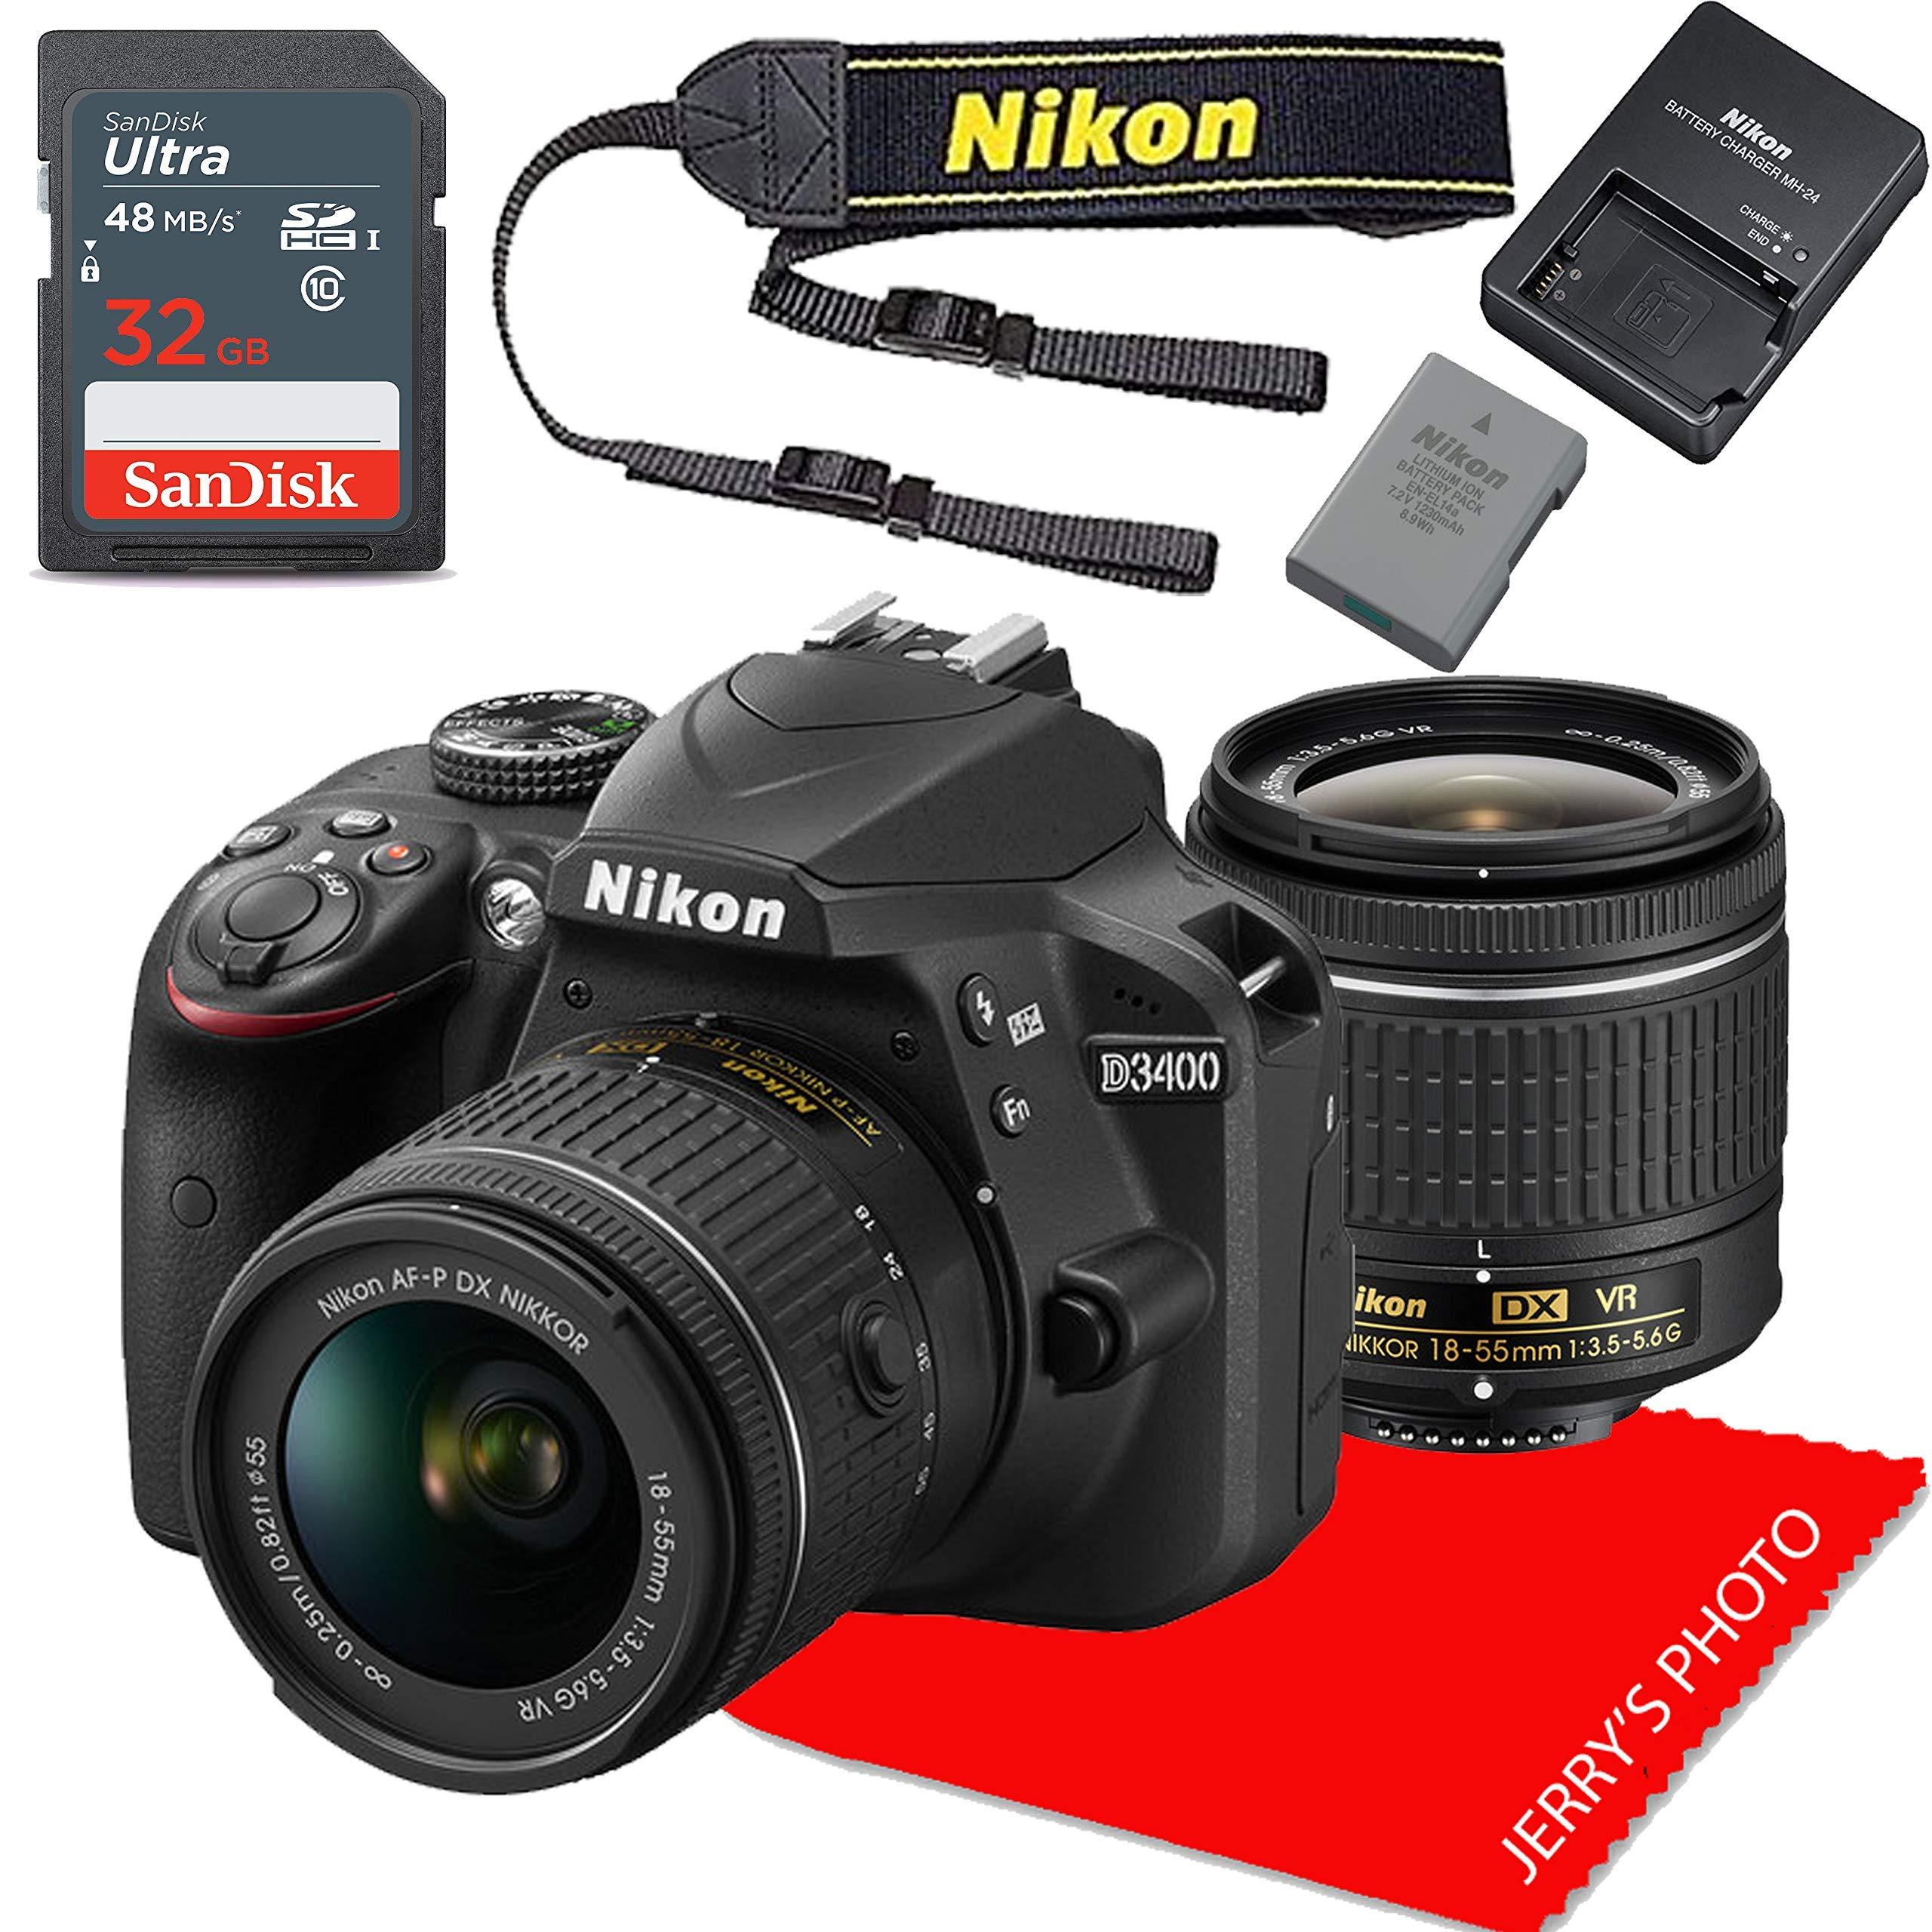 Nikon D3400 w/AF-P DX NIKKOR 18-55mm f/3.5-5.6G VR + 32GB Memory Bundle (Renewed) by Nikon